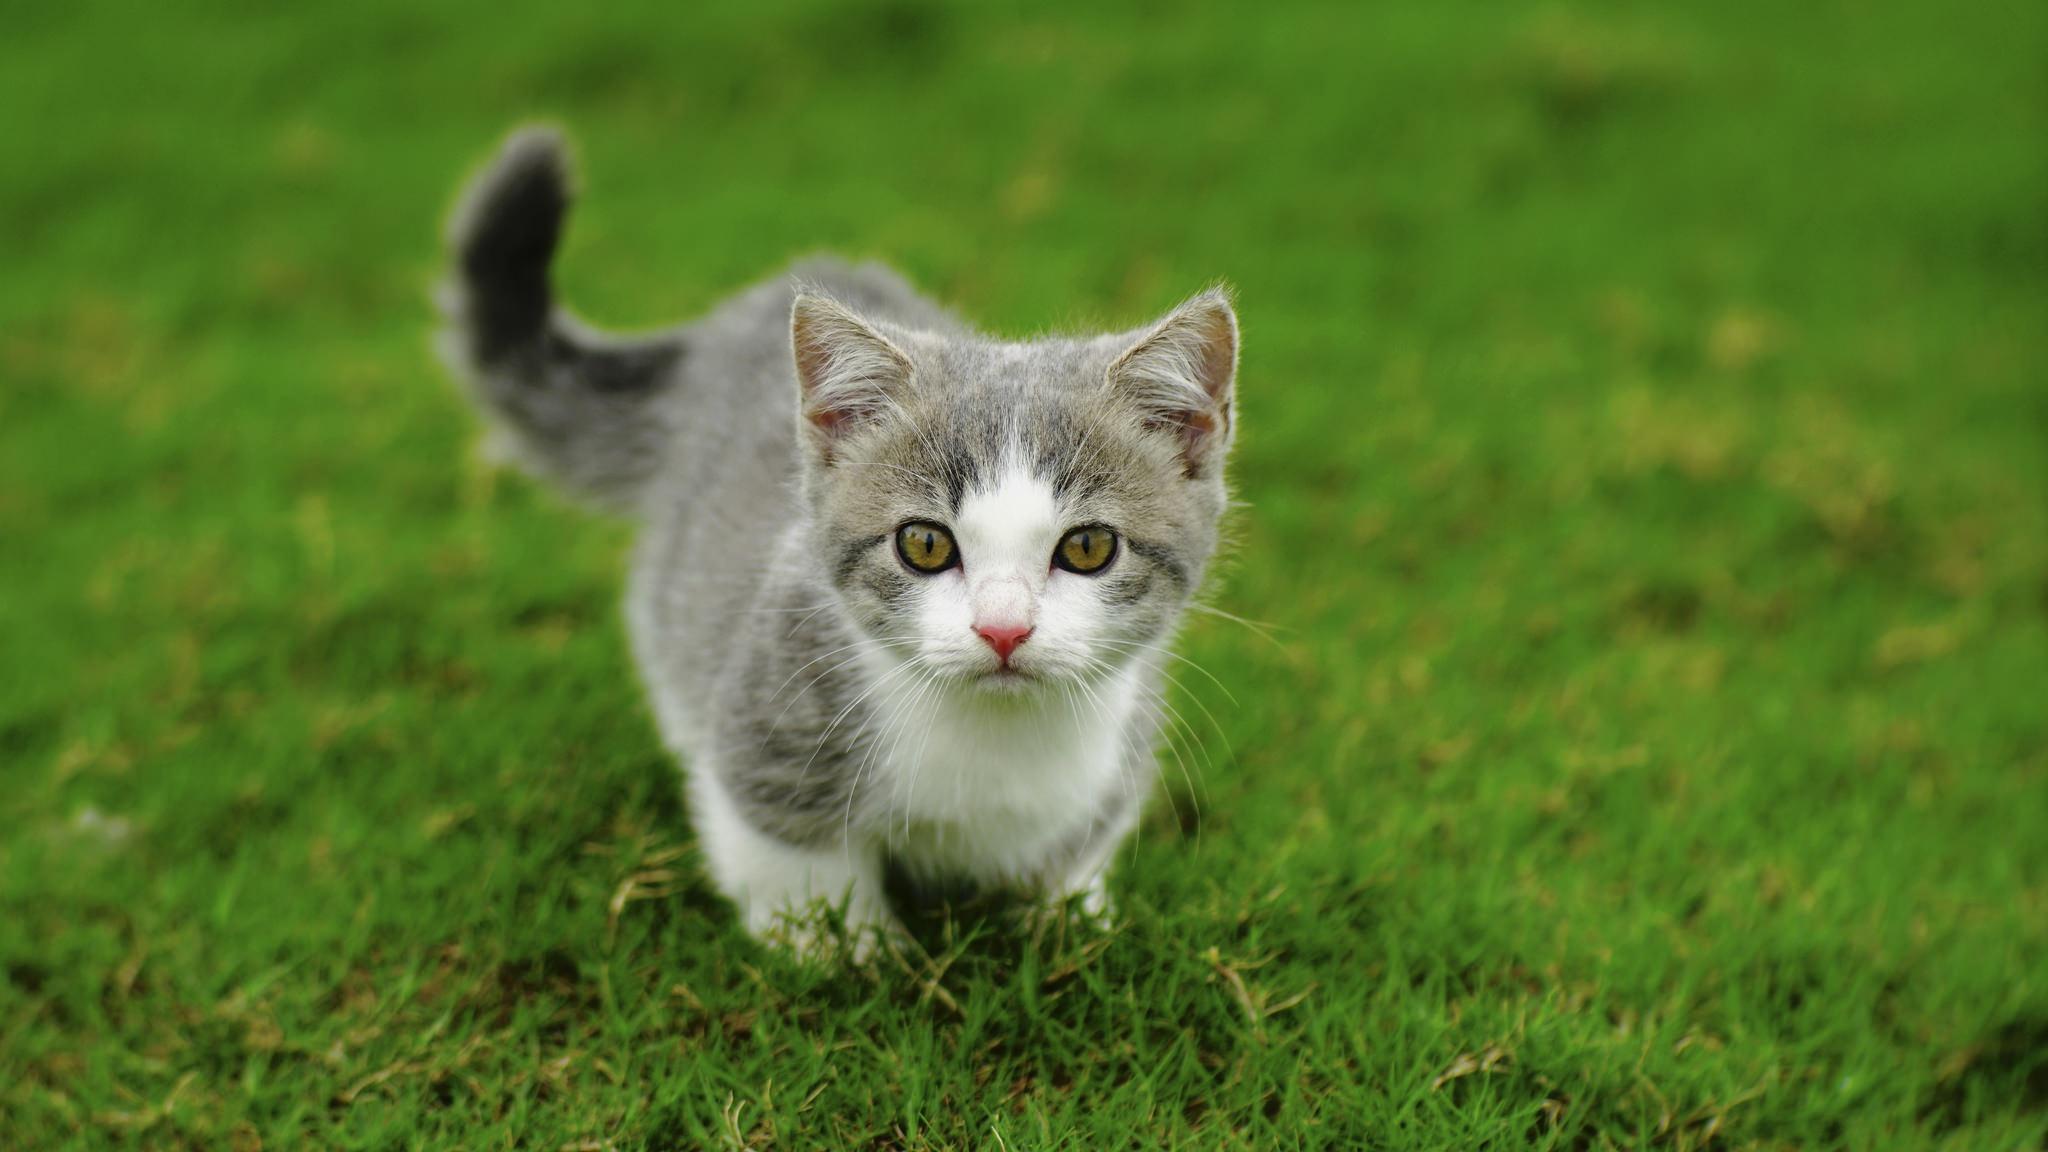 Fondos De Pantalla Césped Gato Animales 2048x1152